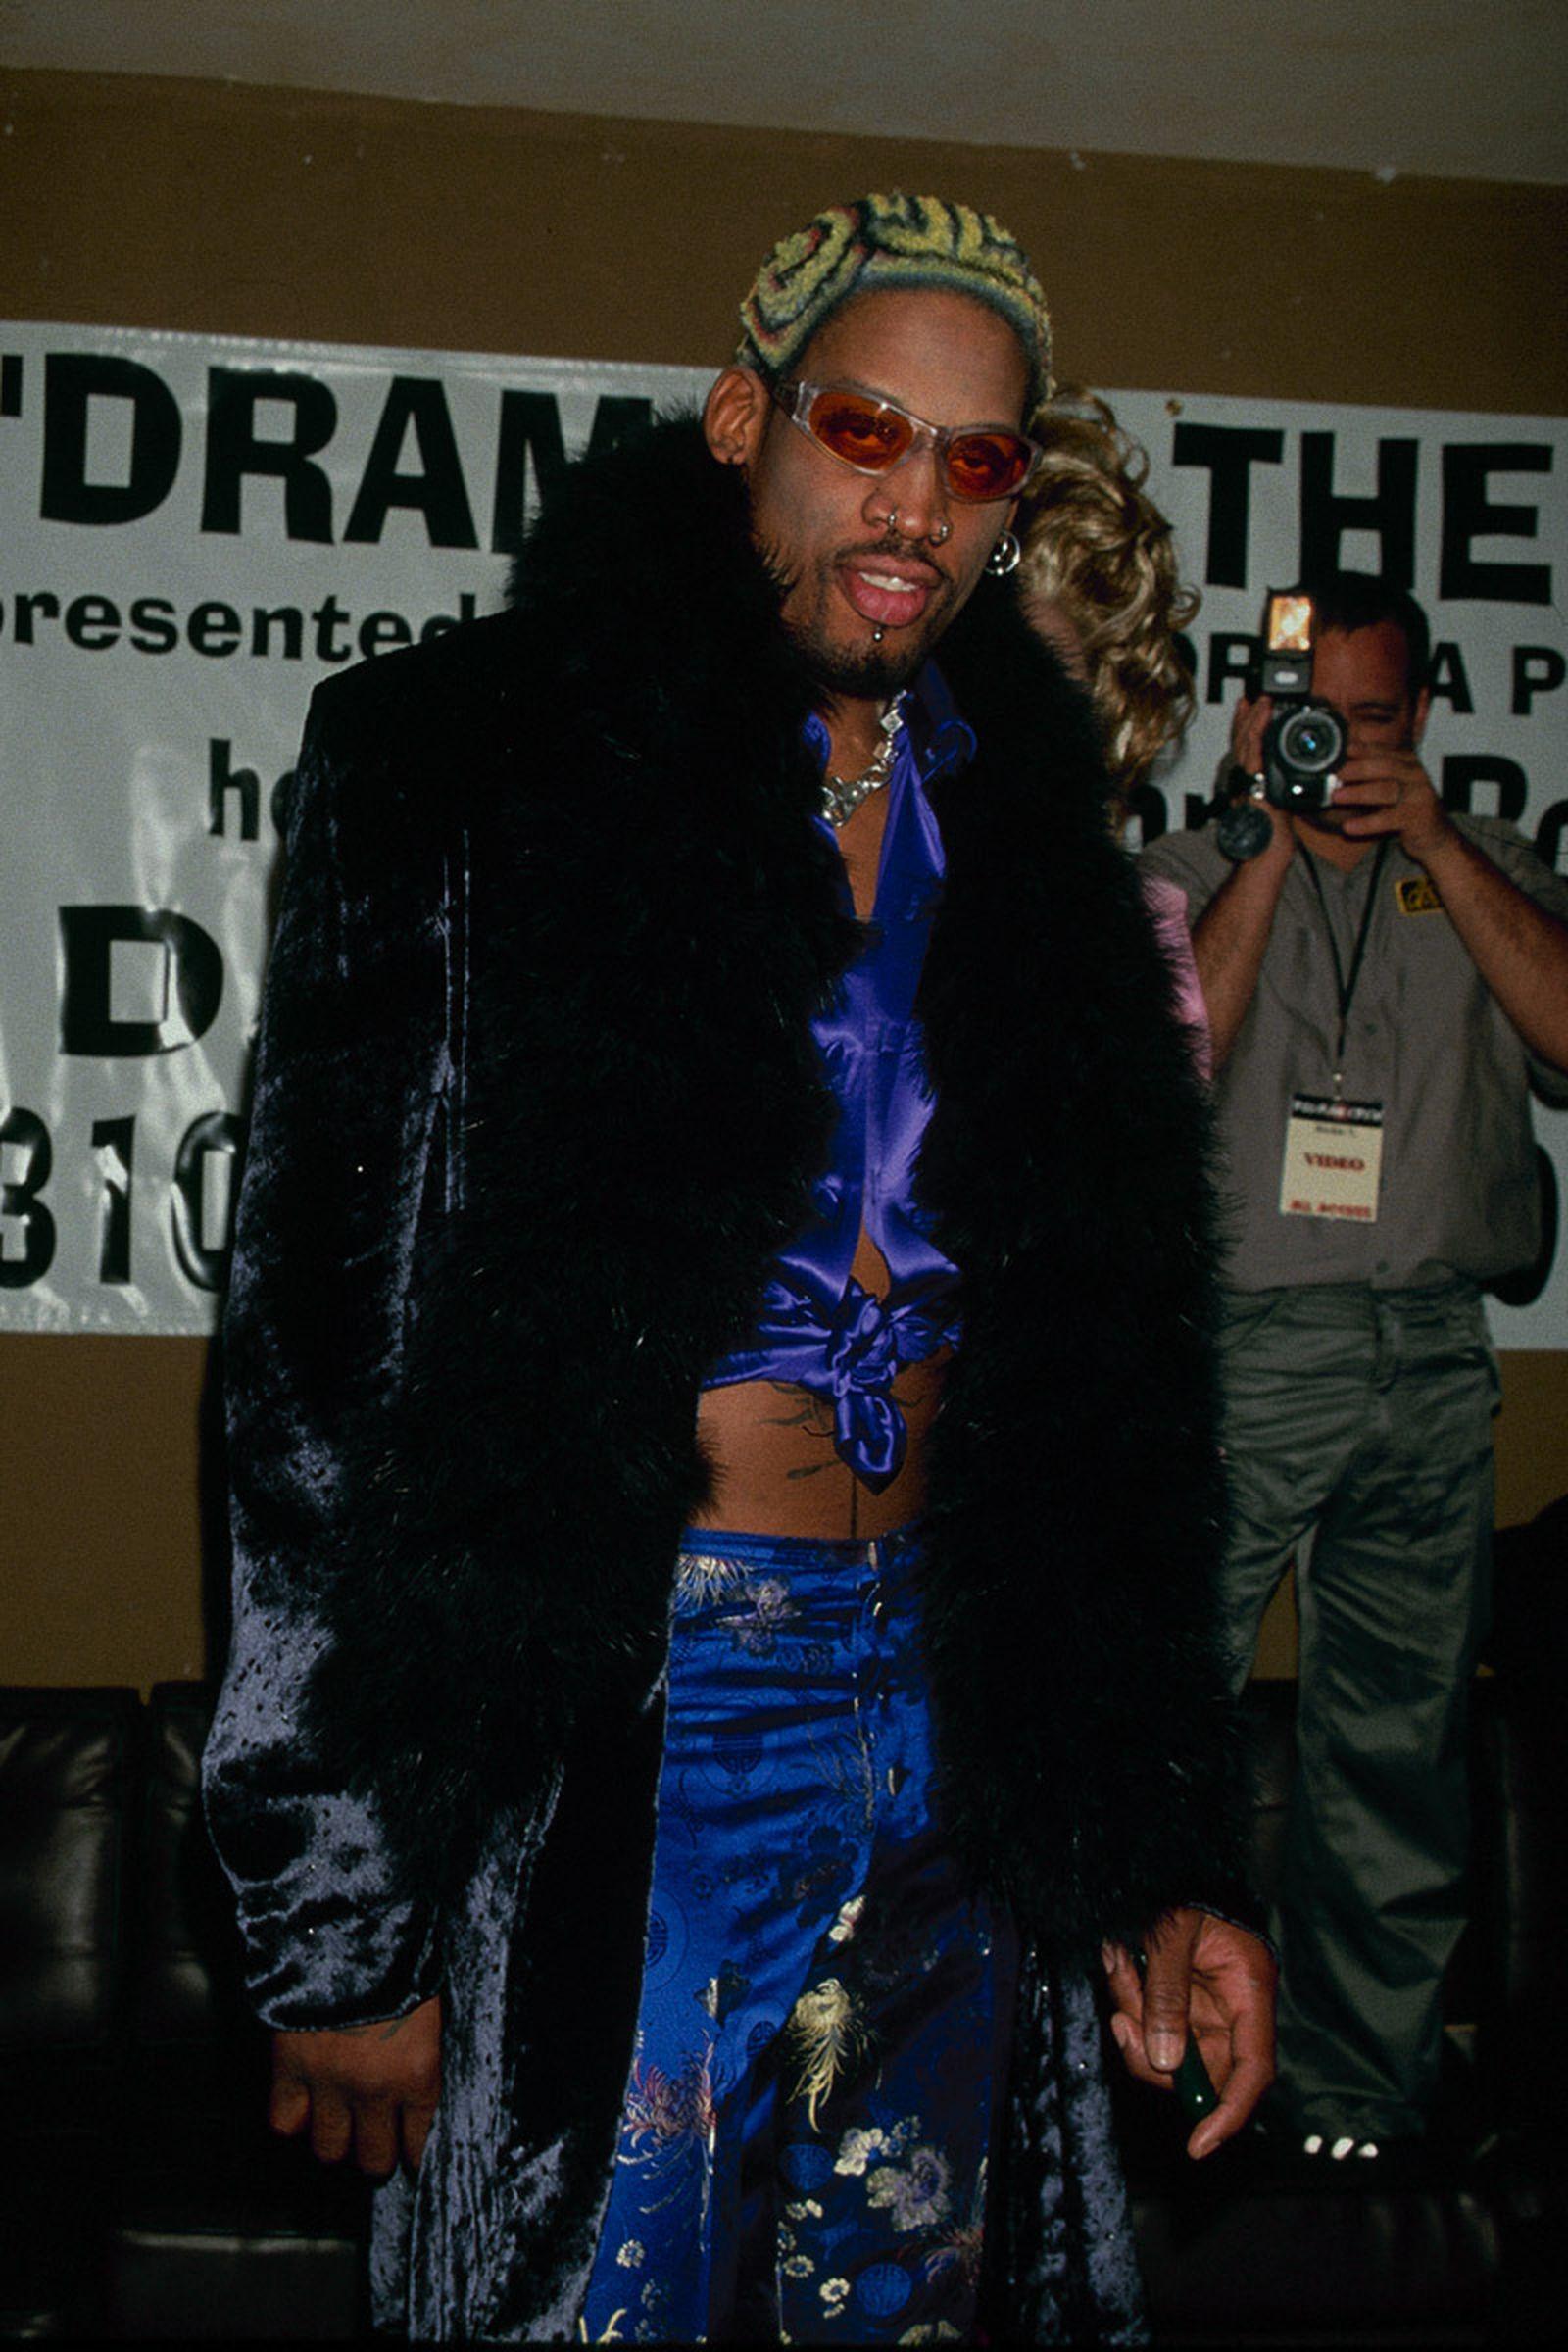 dennis-rodman-was-the-first-soundcloud-rapper-07